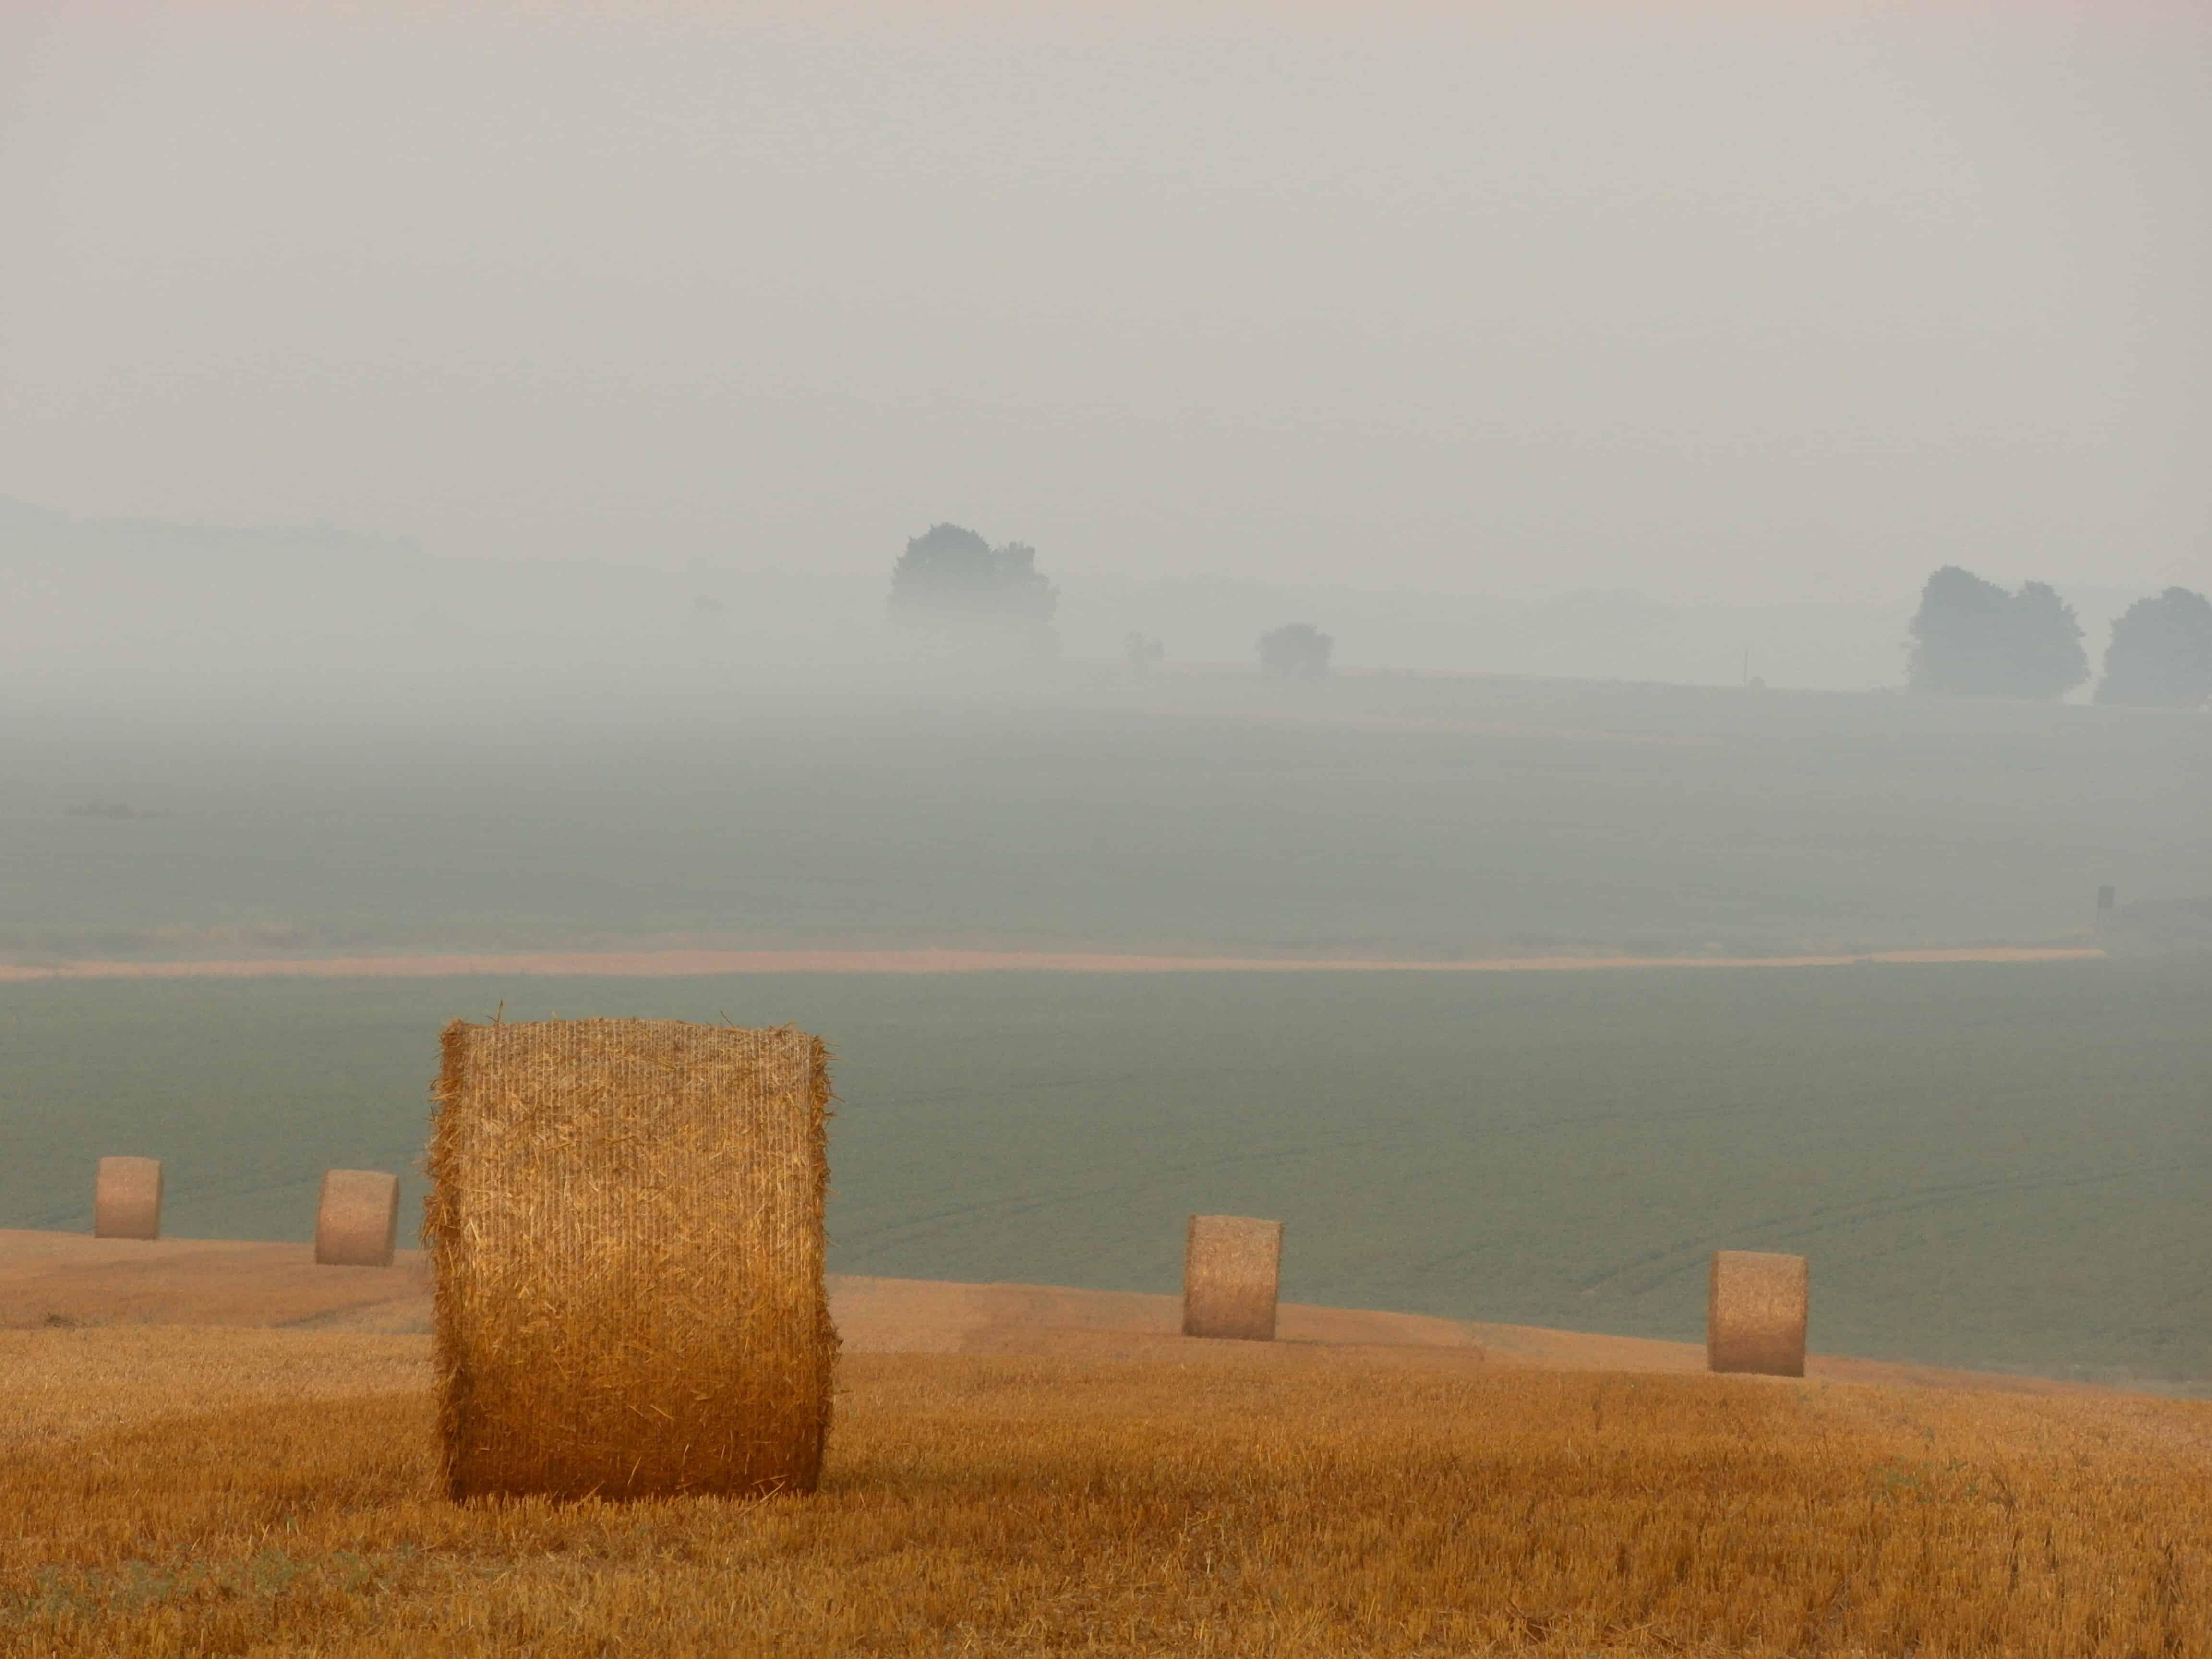 Public Health, Agriculture, health, farming, antibiotics, food environments